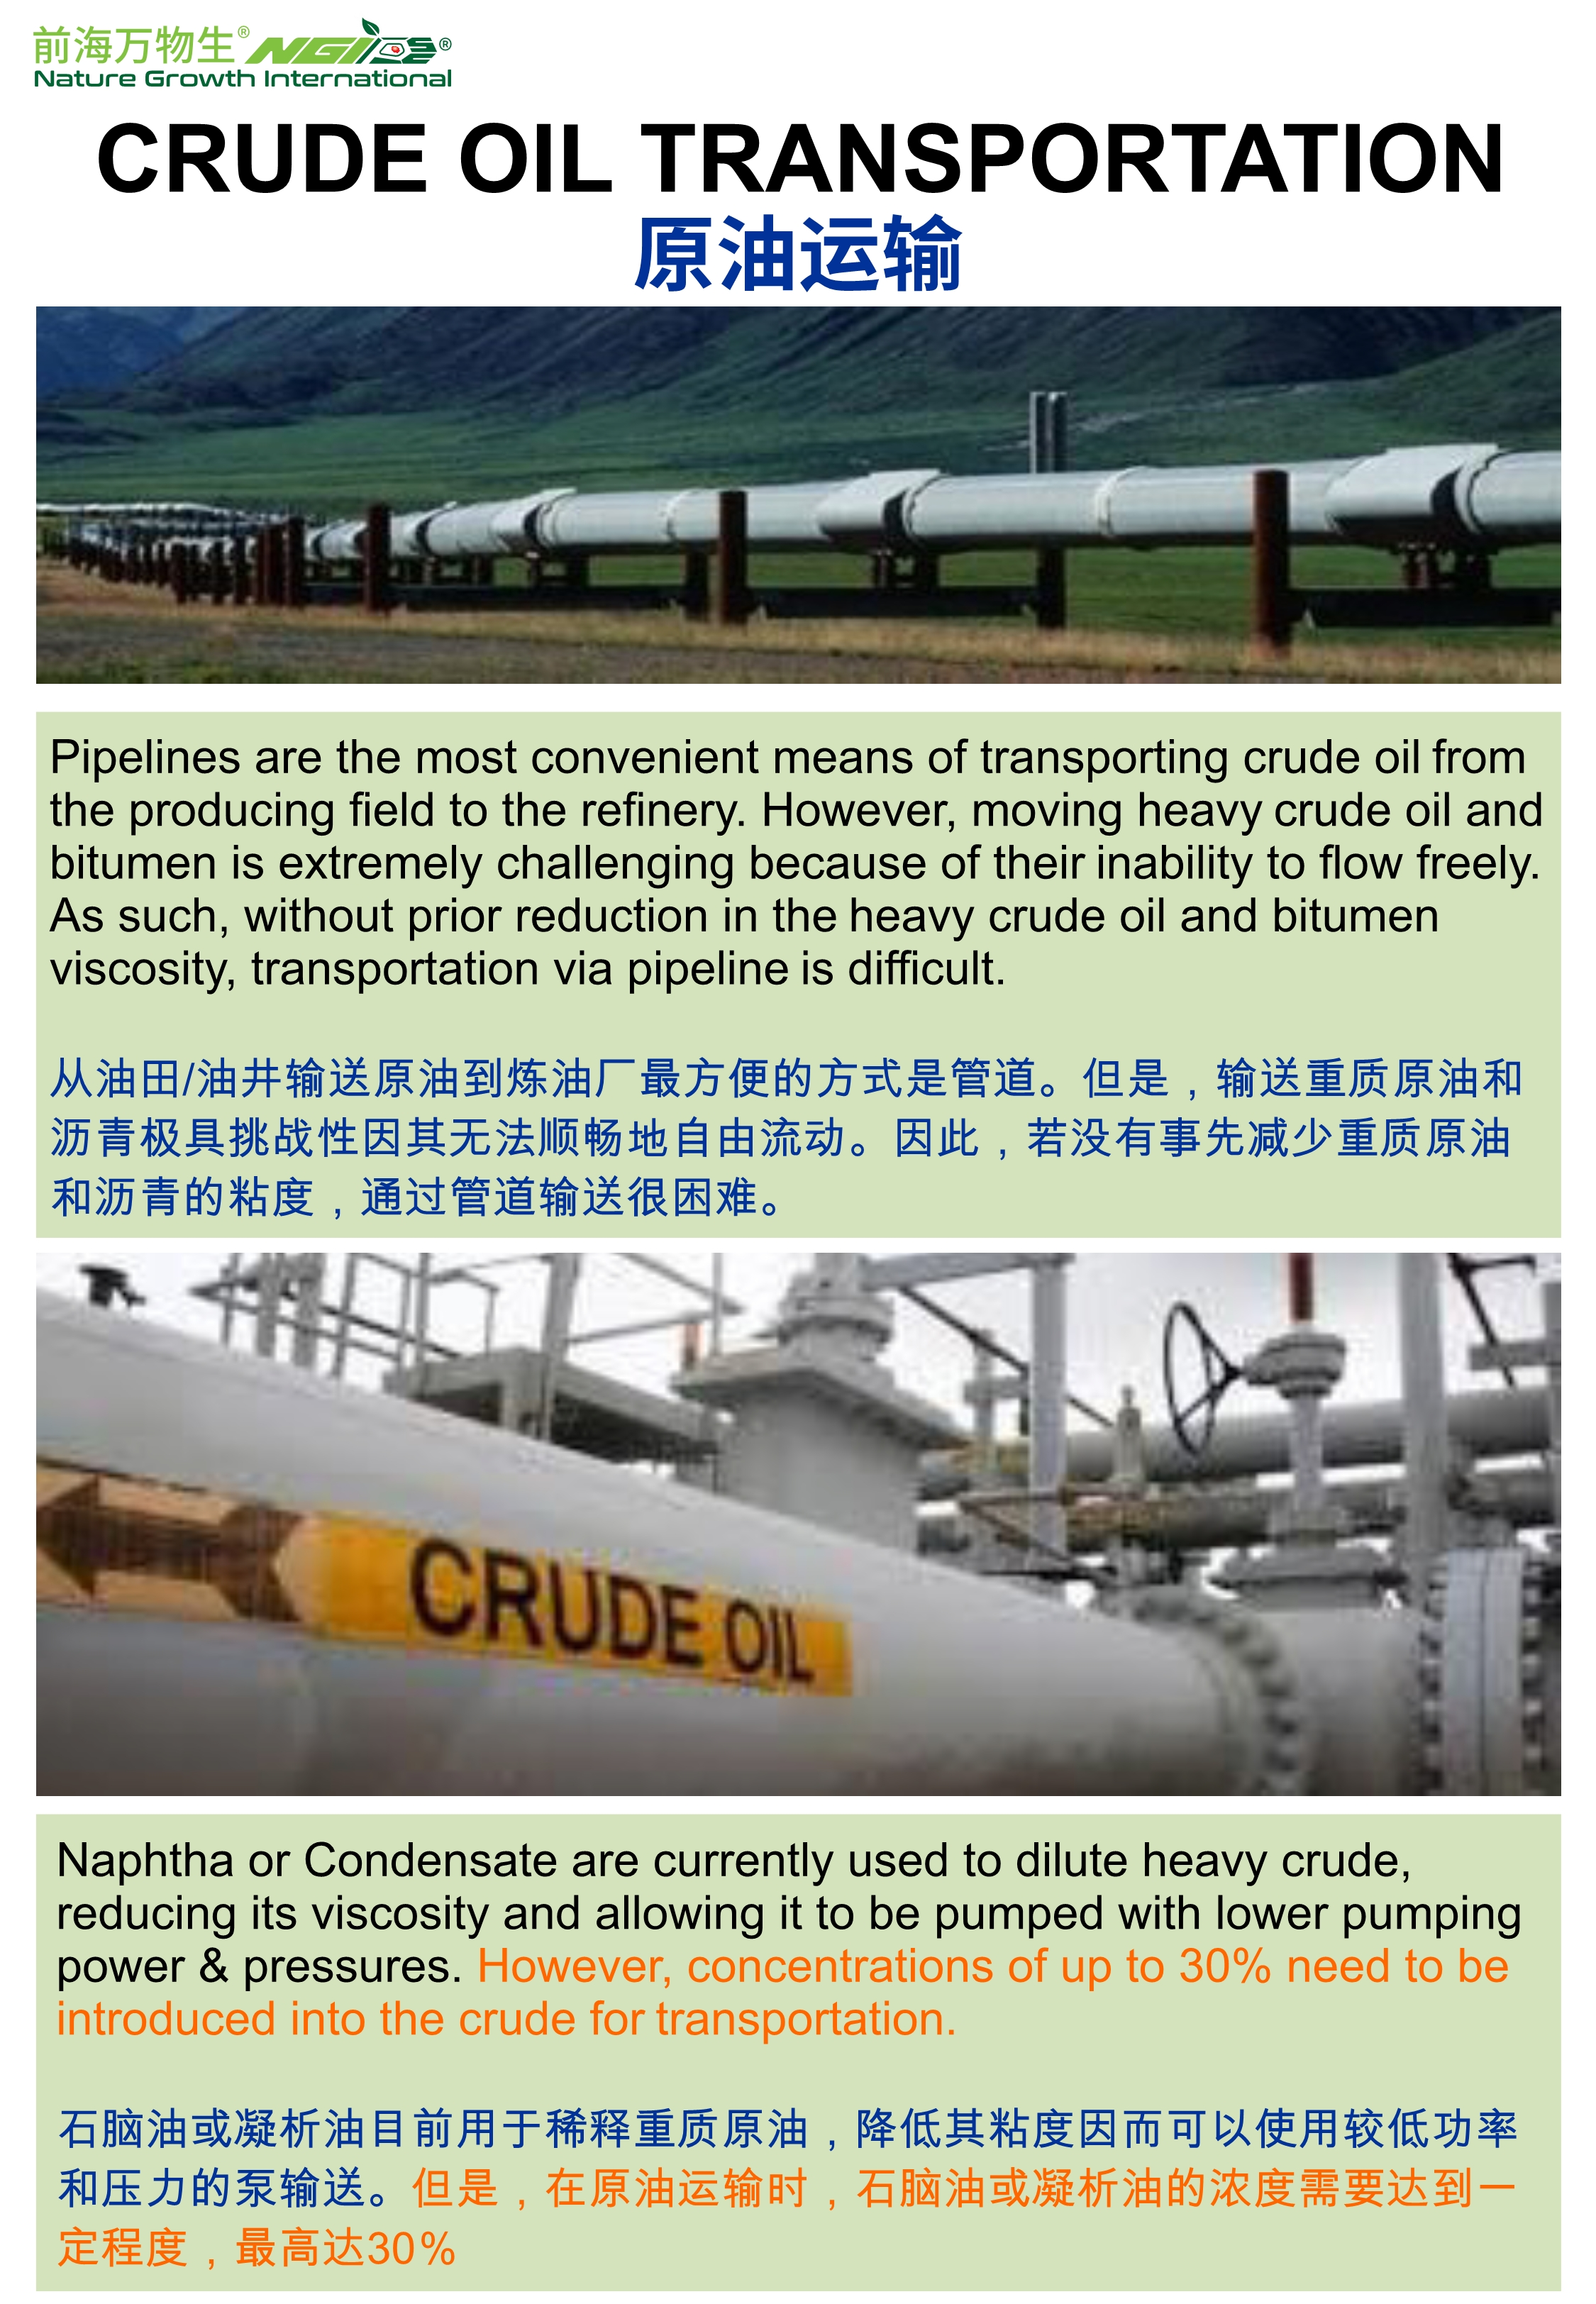 德赢Vwin-生物石油公司NGI-OG1中英20190521v3_jpg-德赢Vwin-生物石油公司NGI-OG1中英20190521v3_6